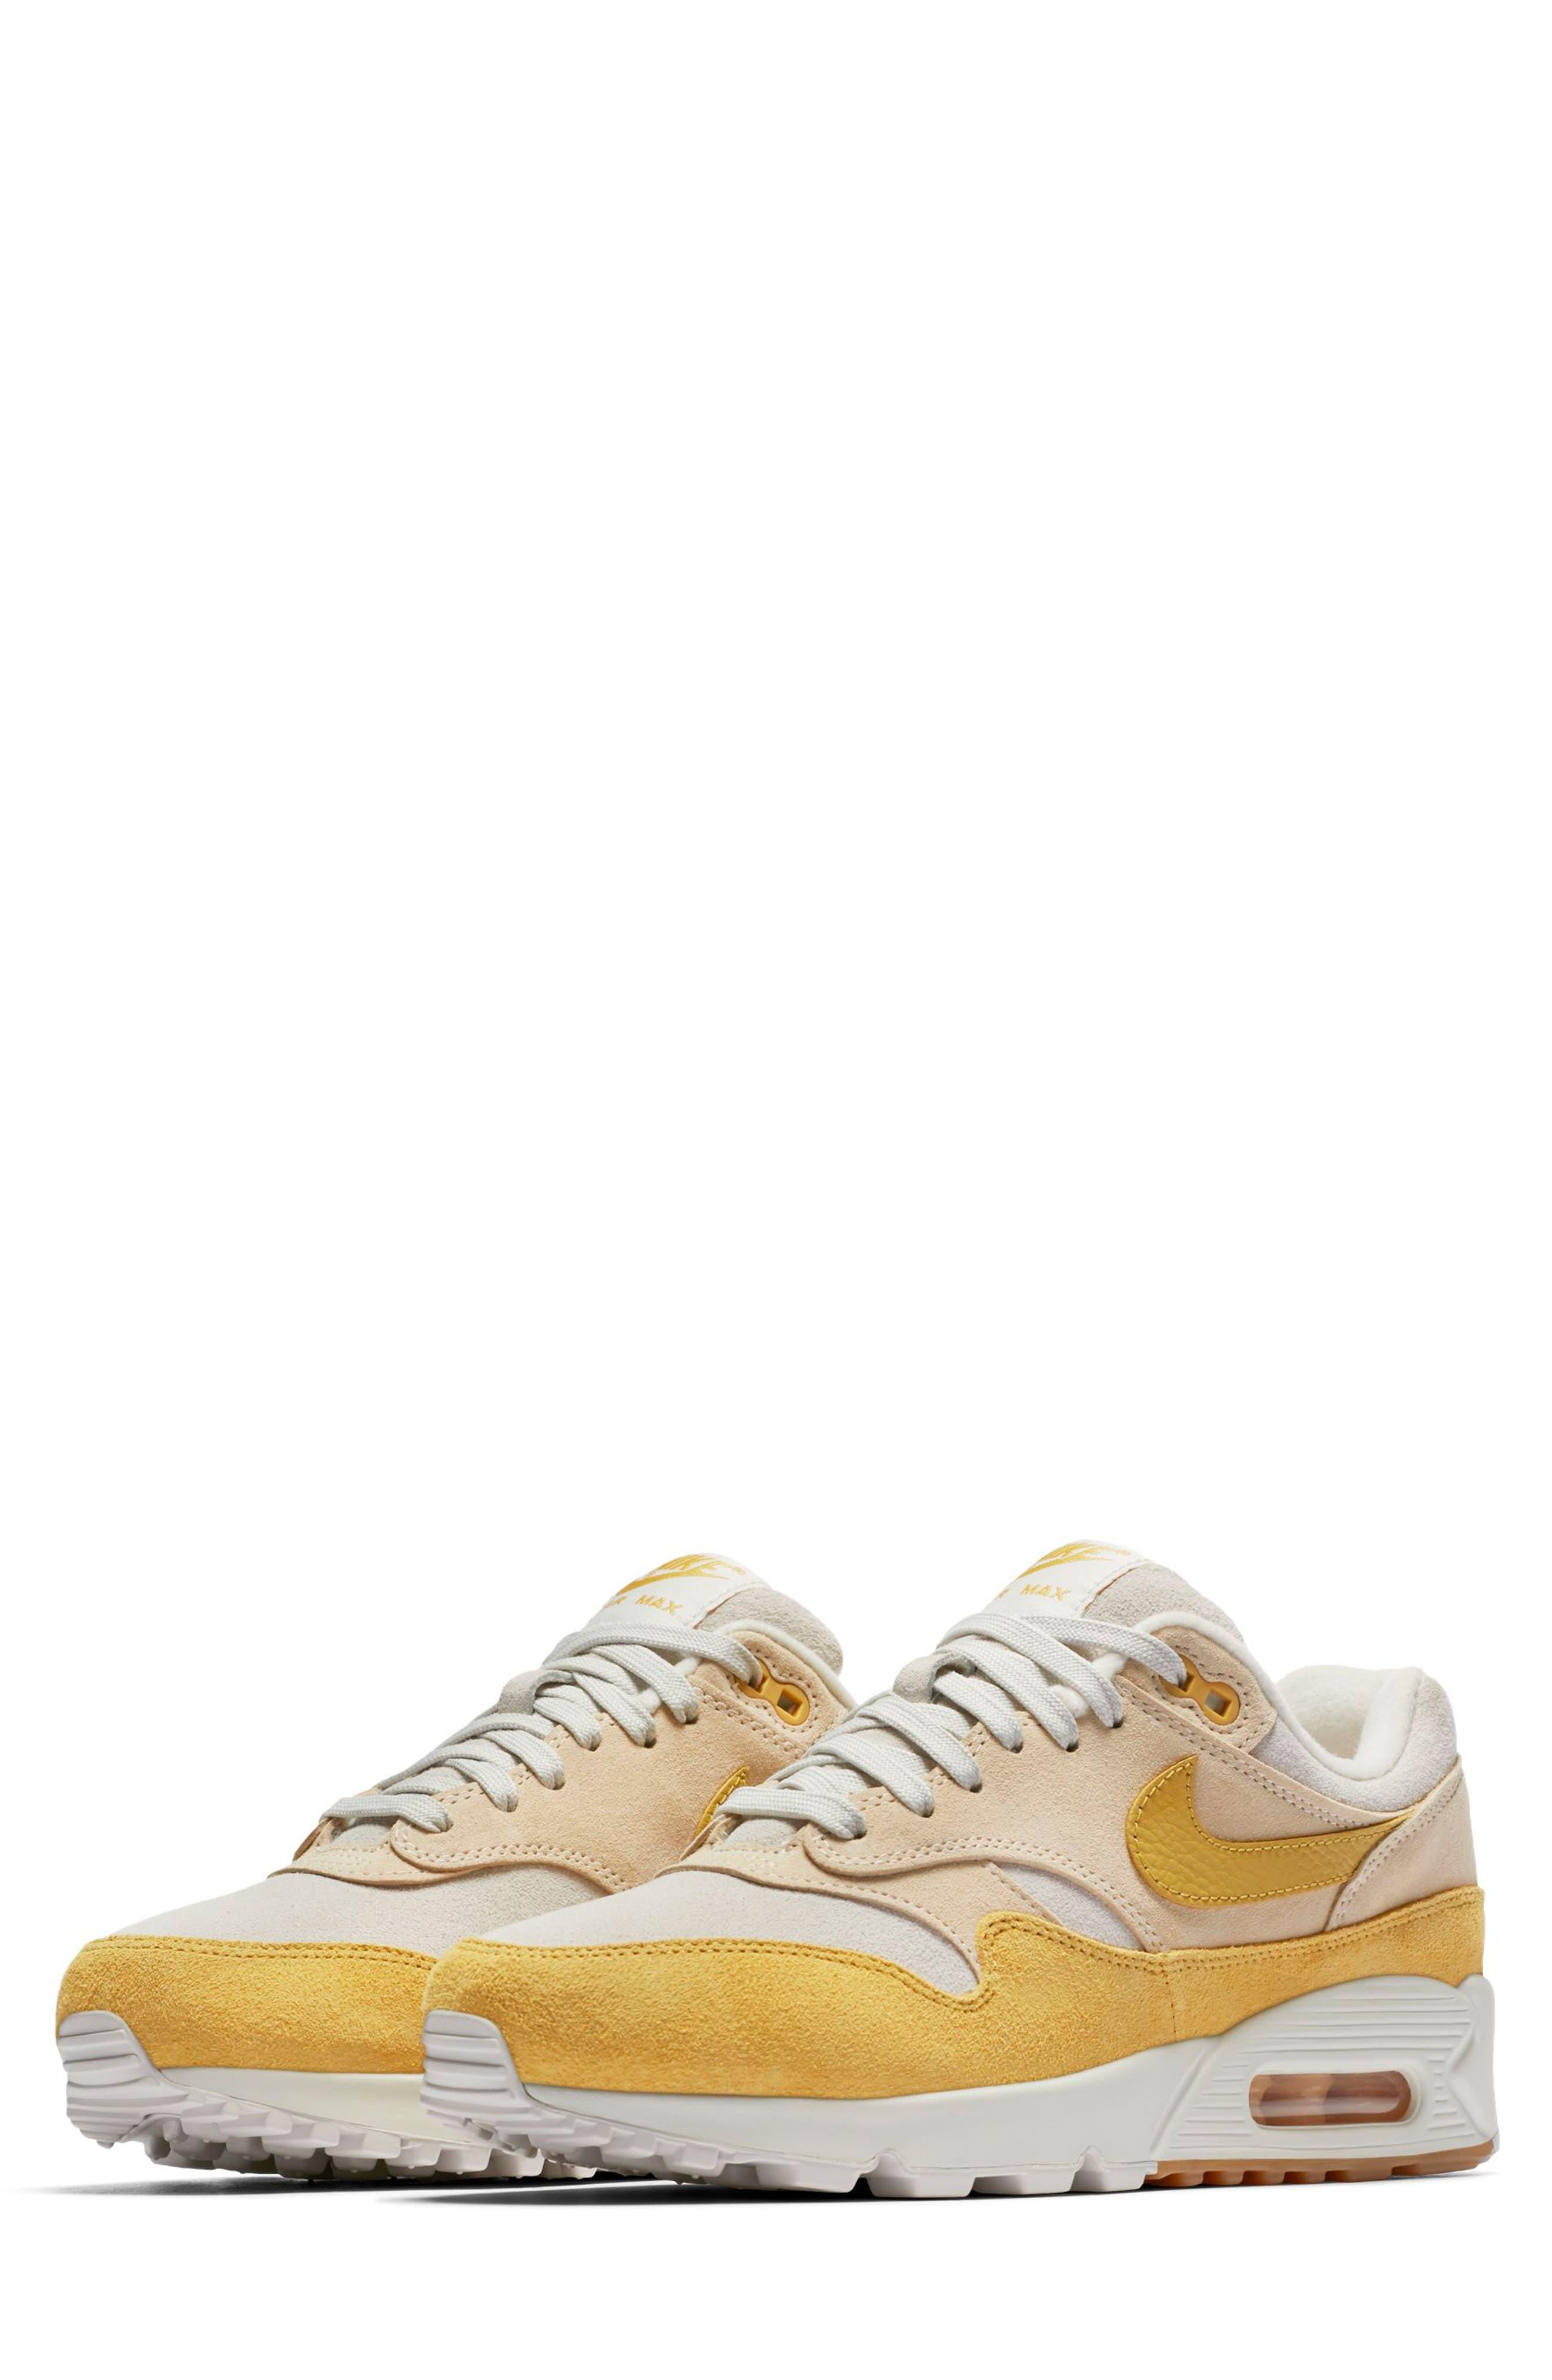 the latest 7e058 73323 ... where can i buy nike air max 90 1 sneaker women 47b07 c777e